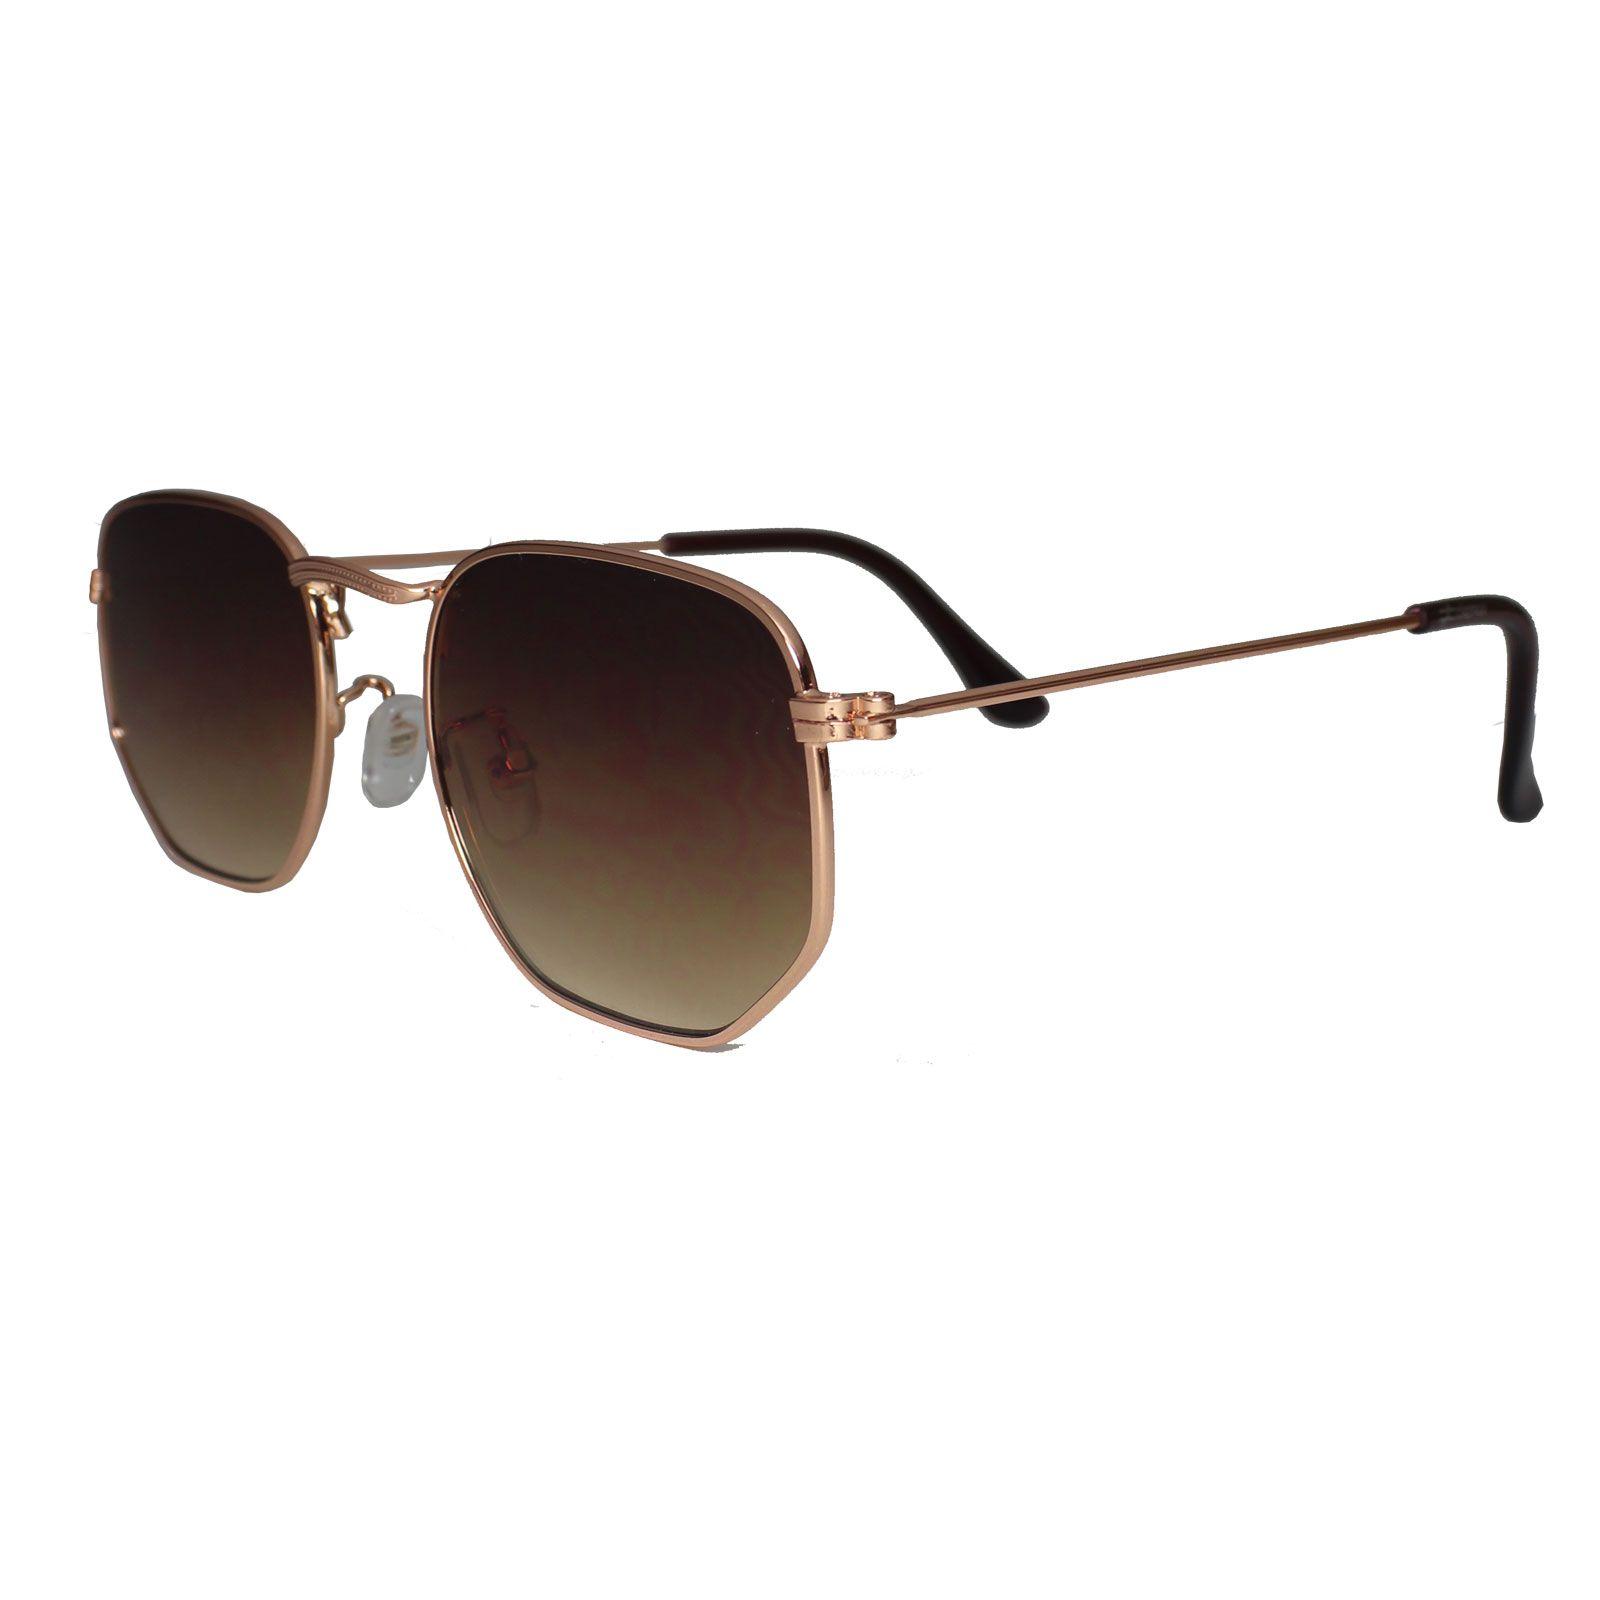 Óculos De Sol Díspar D1625 Hexagonal Lentes Retas Dourado